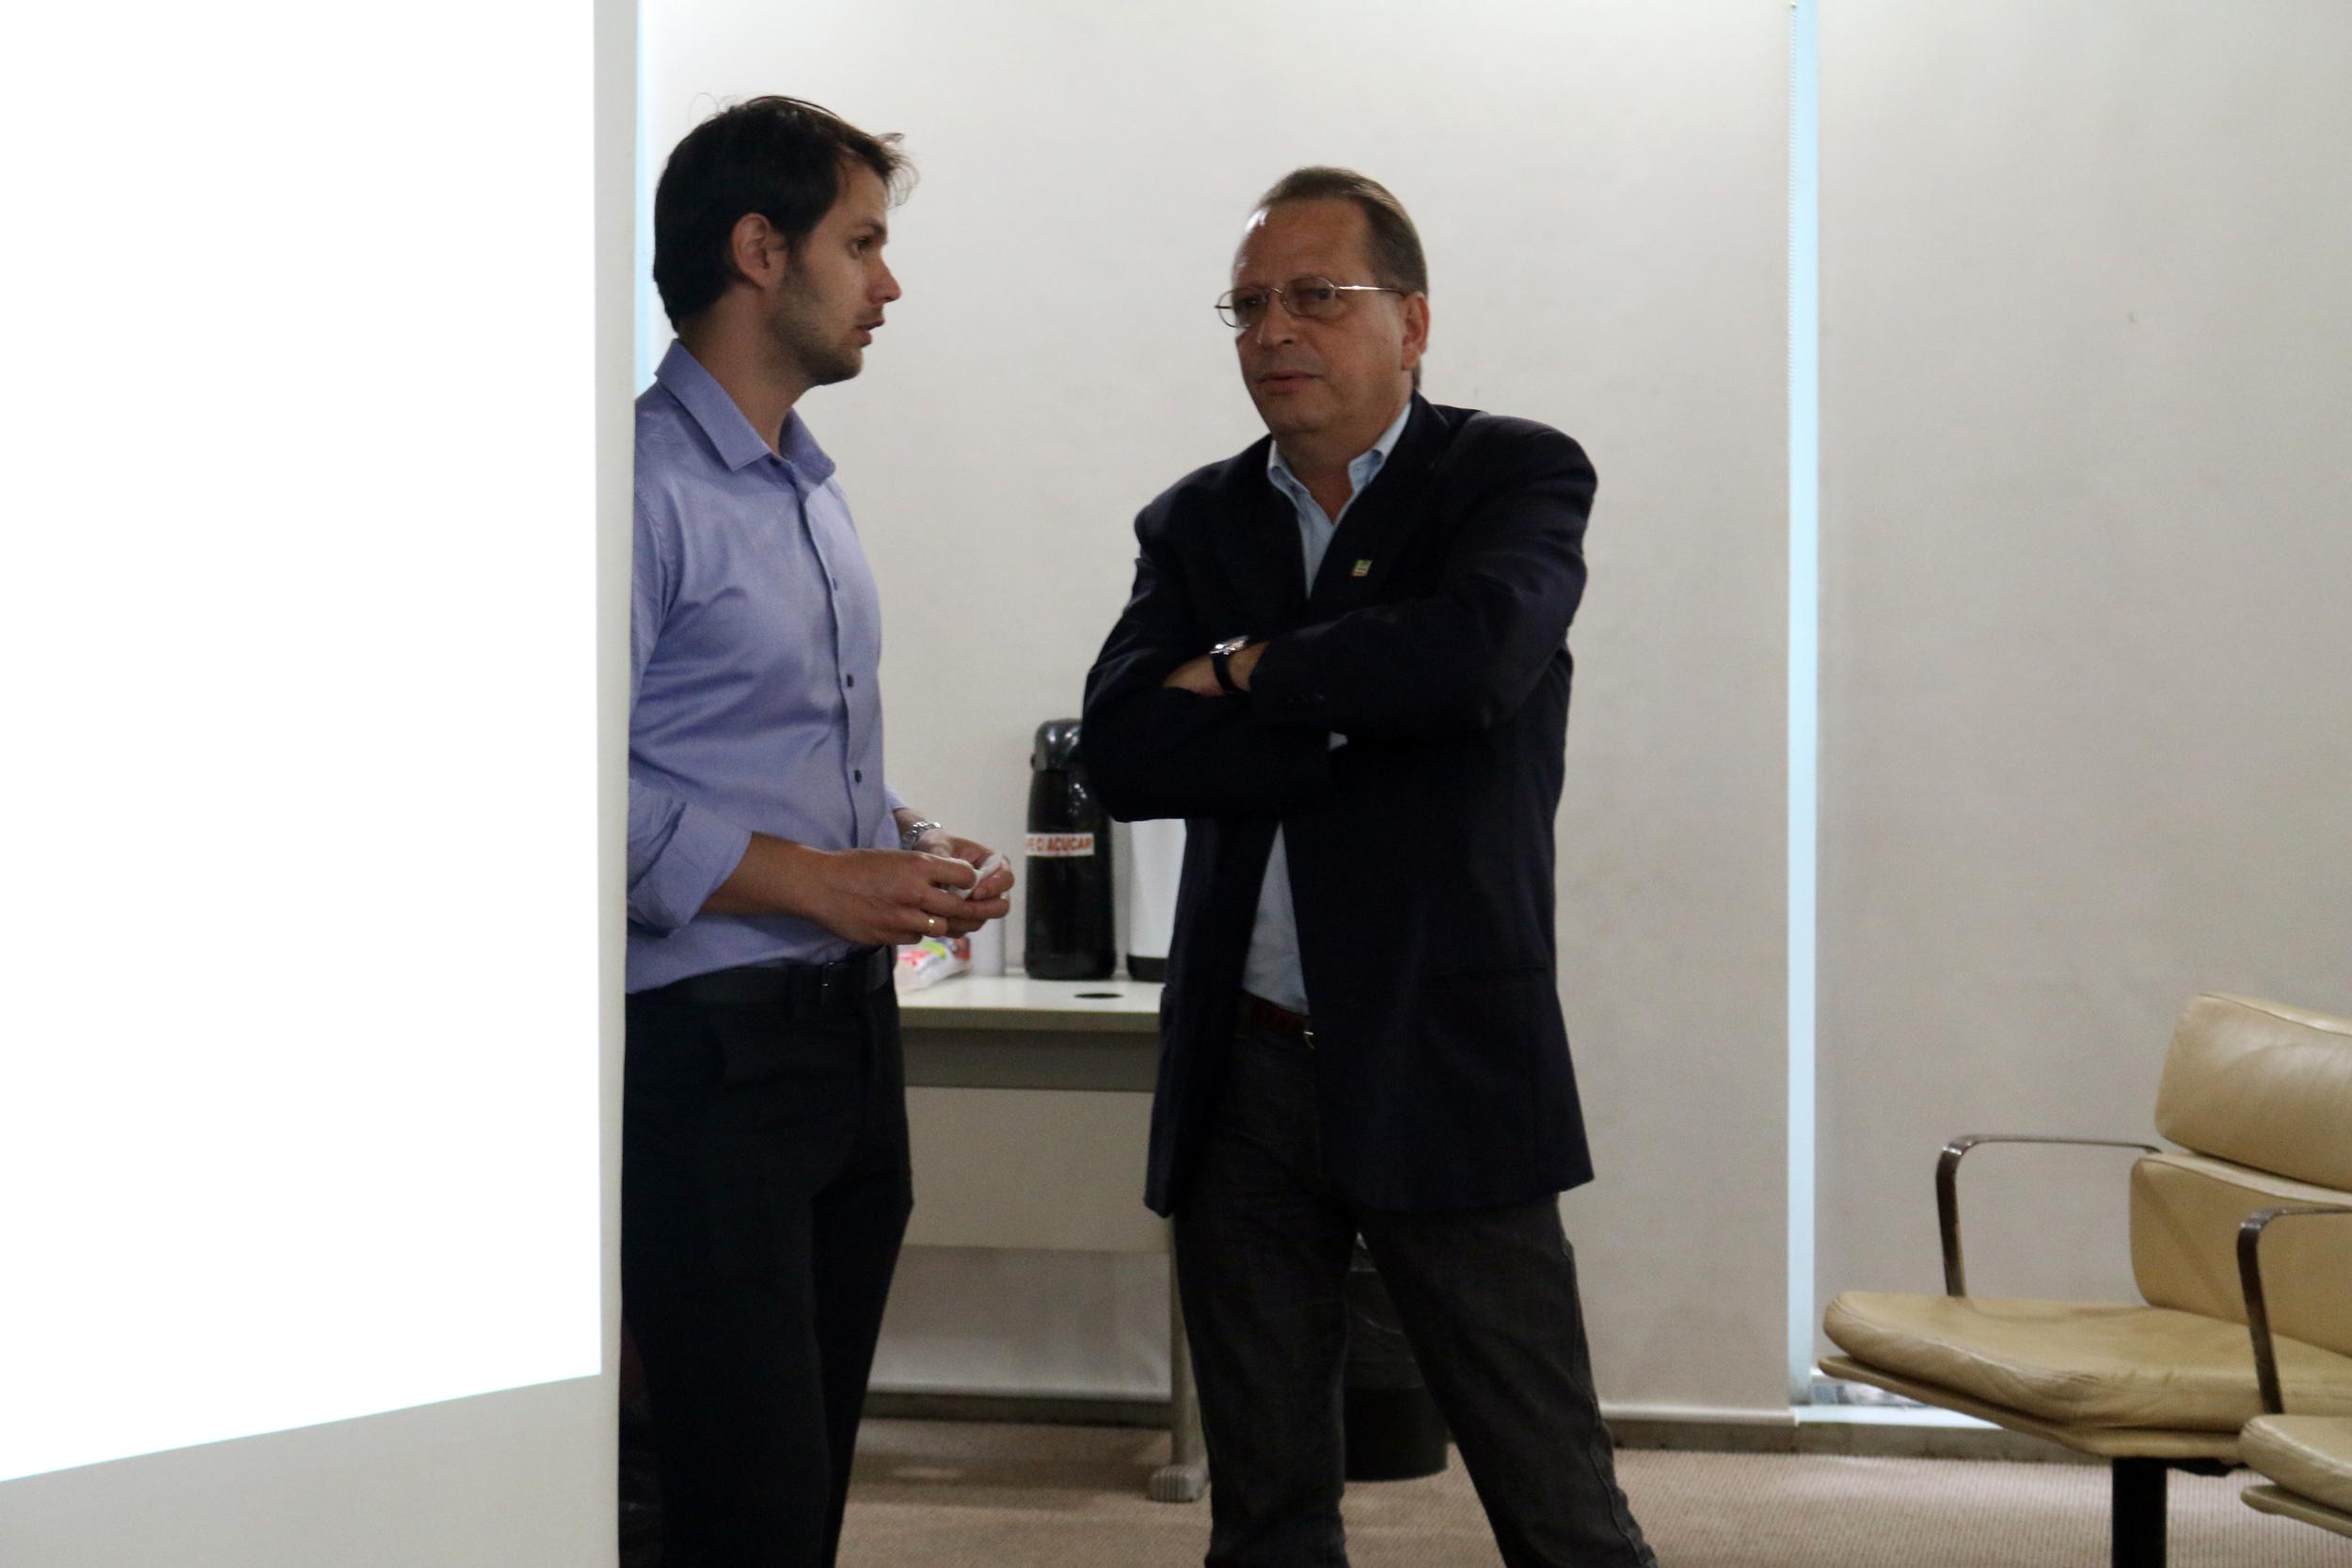 Paulo Brunet, Valmir Dantas - AGE 13-03-2015 - MP - Filipe Calmon - ANESP.jpg